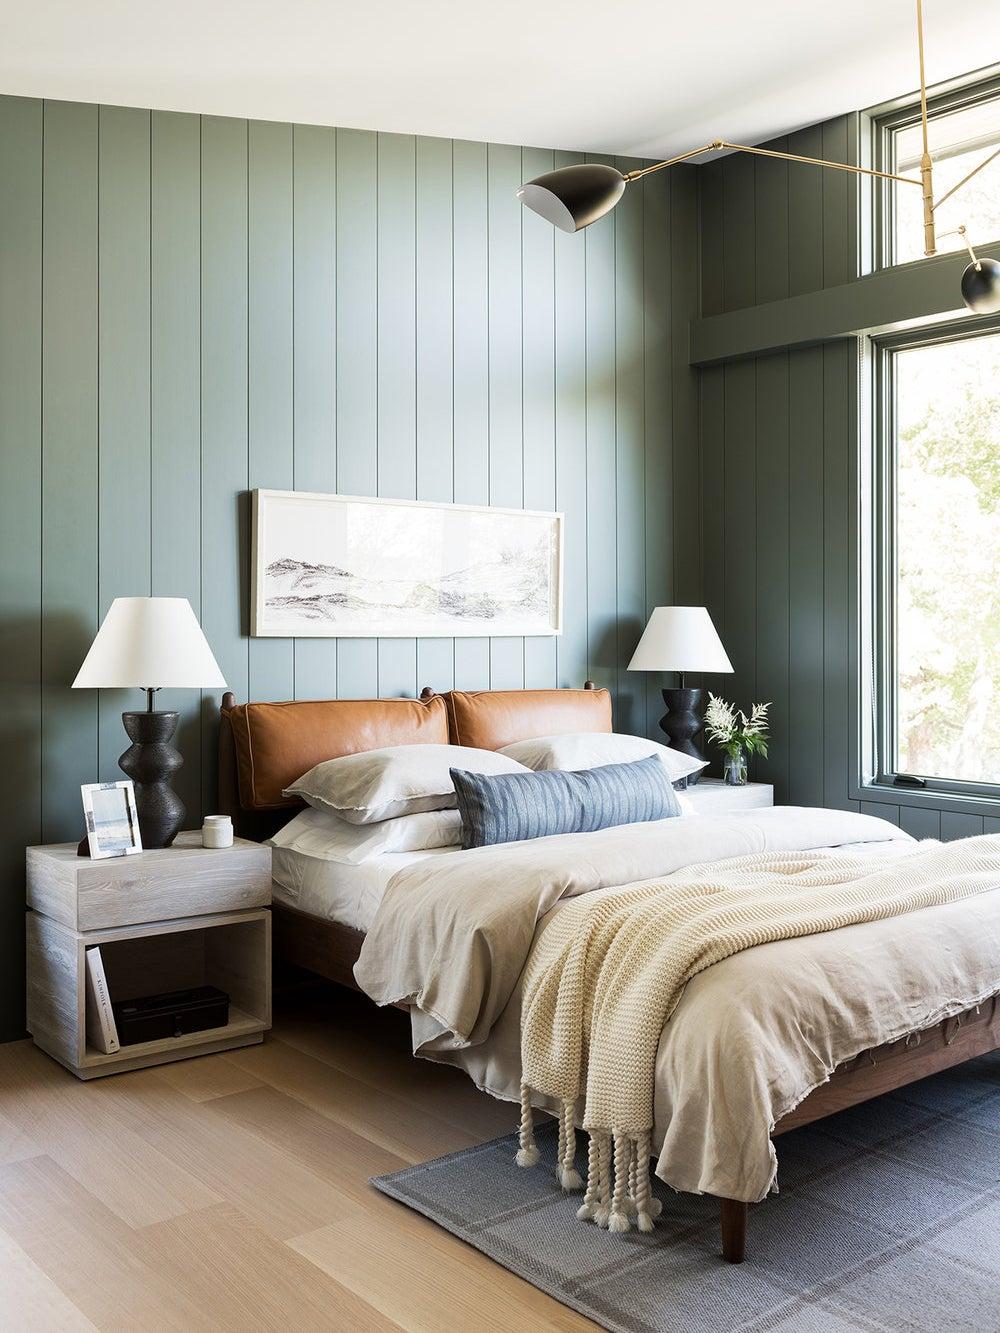 10 Sage Green Decorating Ideas That